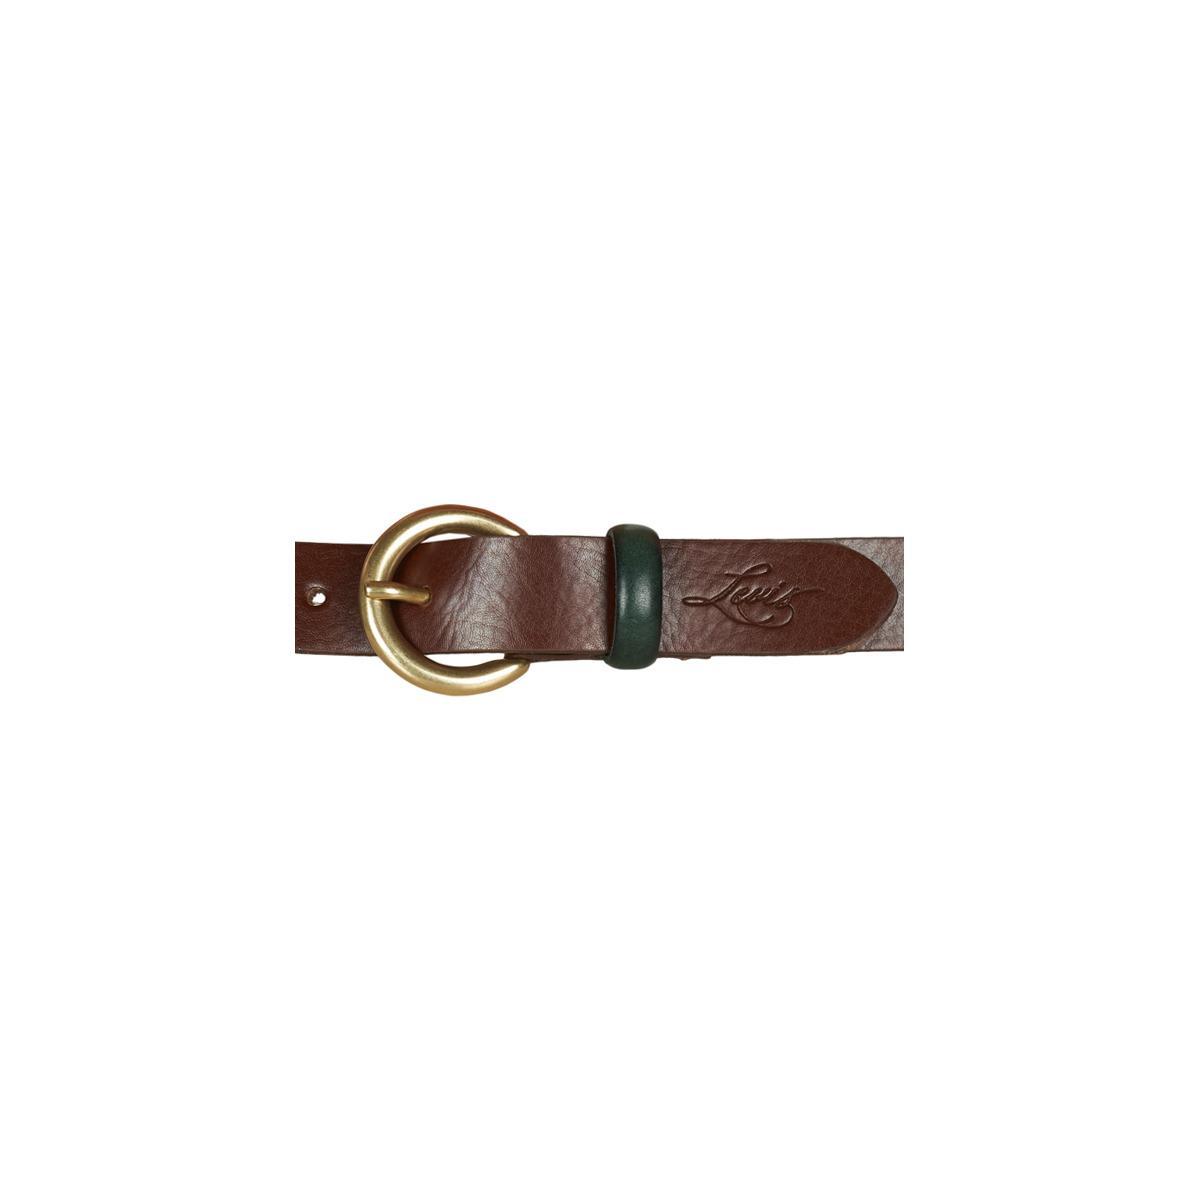 Levi S Levis Larkspur Women s Belt In Brown in Brown - Lyst 13191884f99